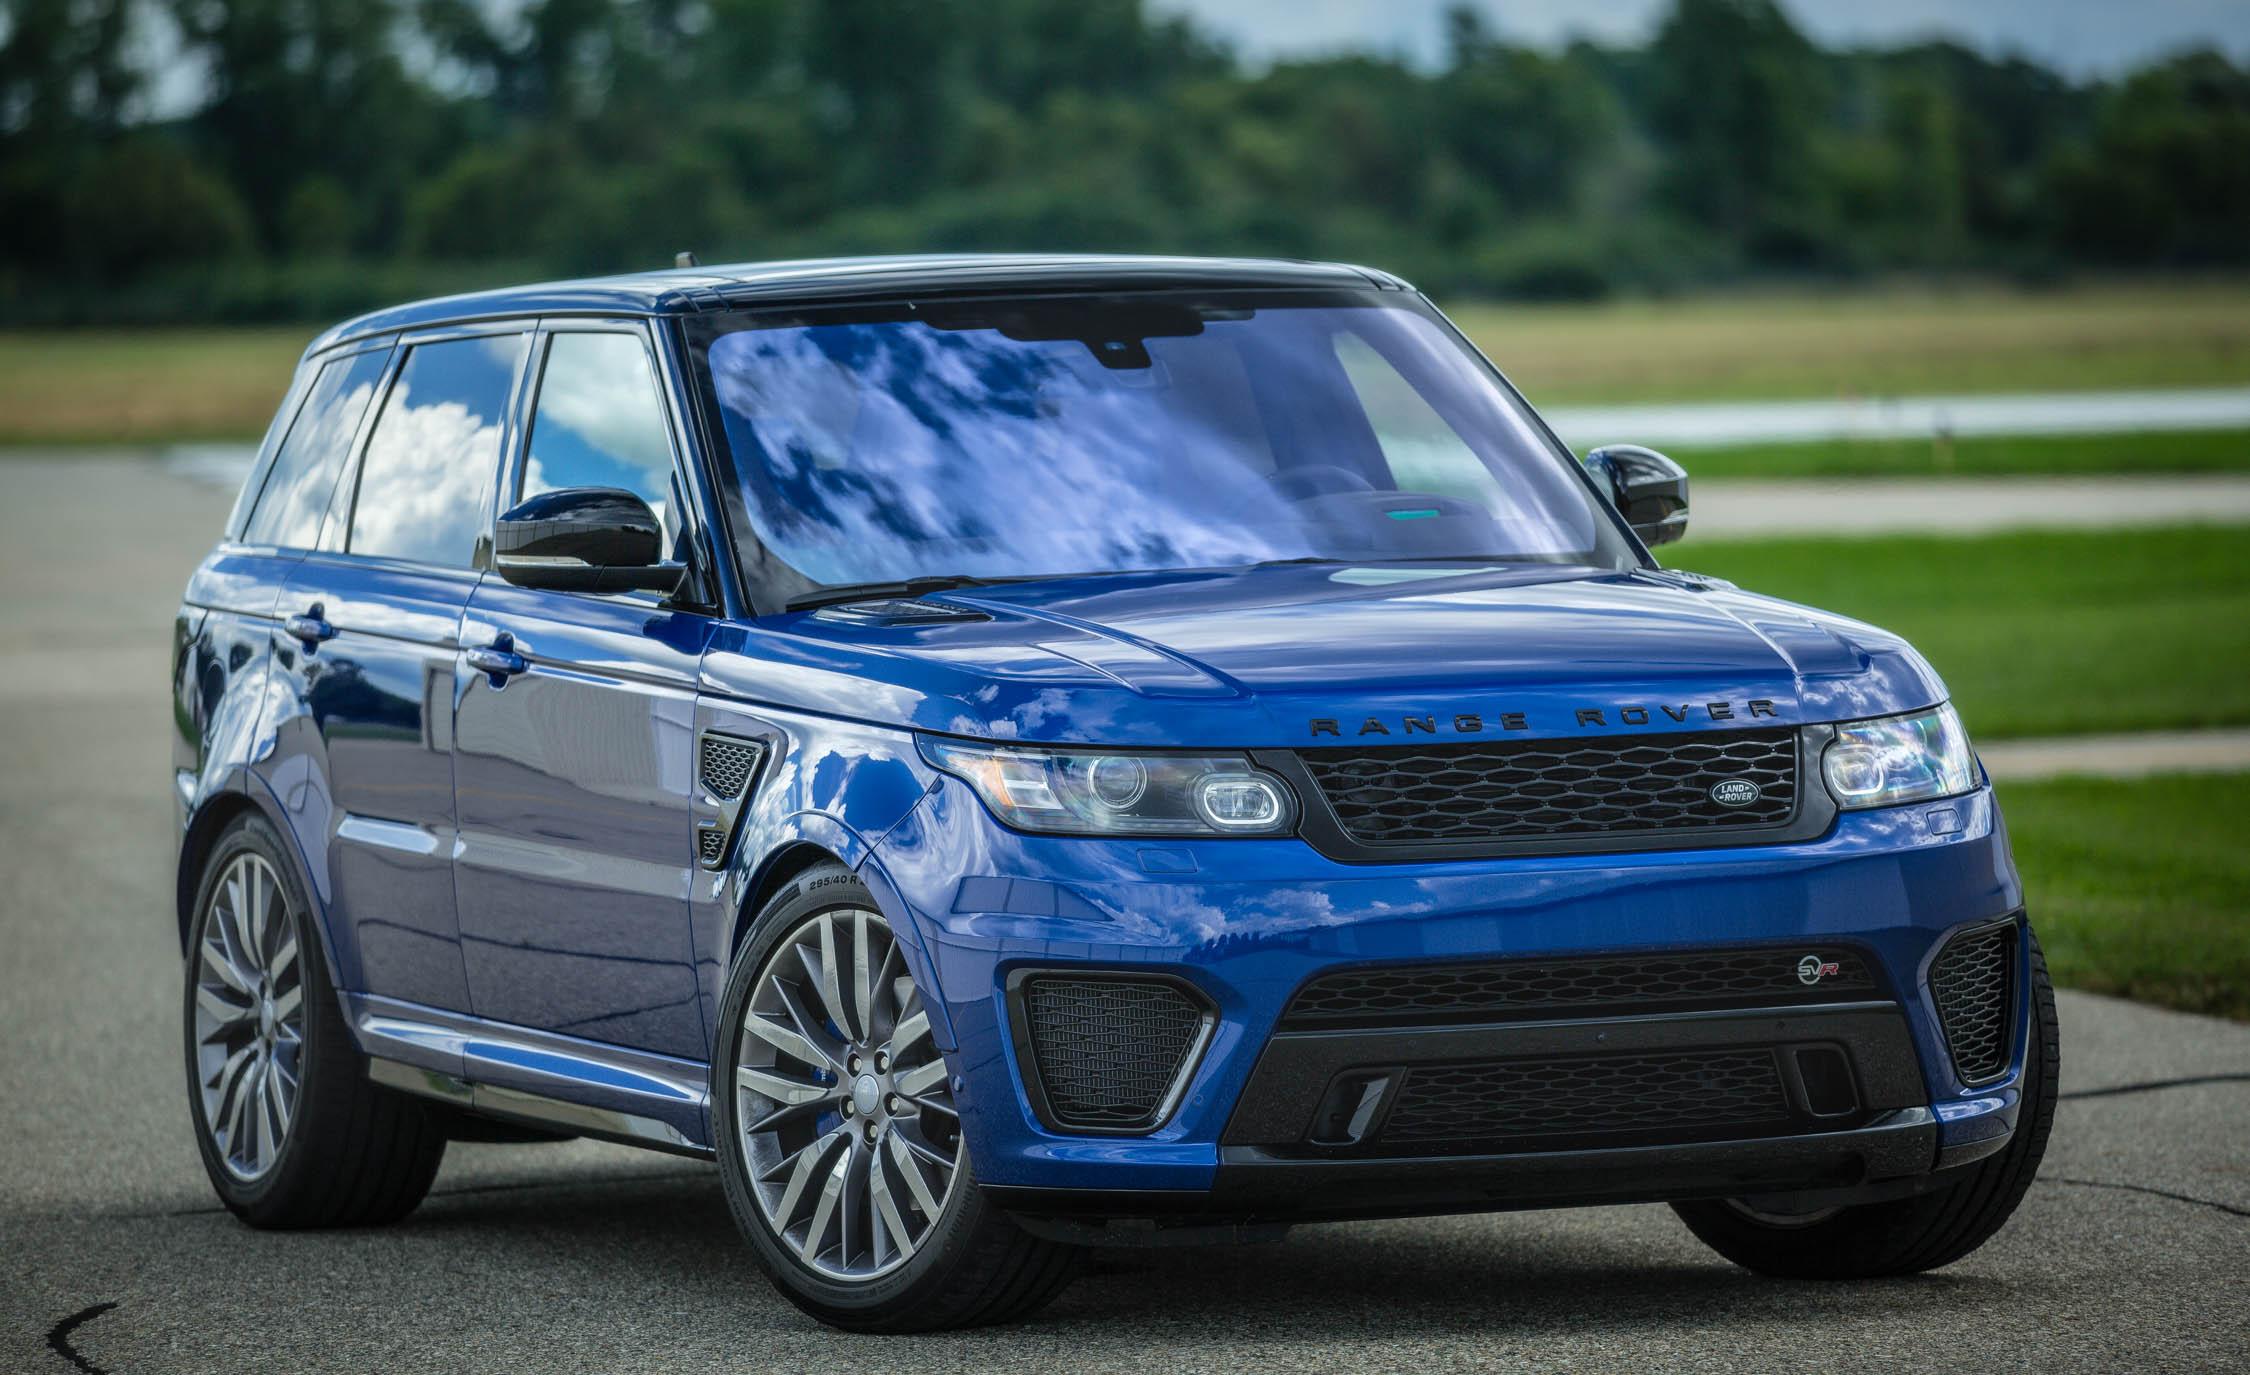 2016 Land Rover Range Rover Sport SVR (Photo 6 of 7)